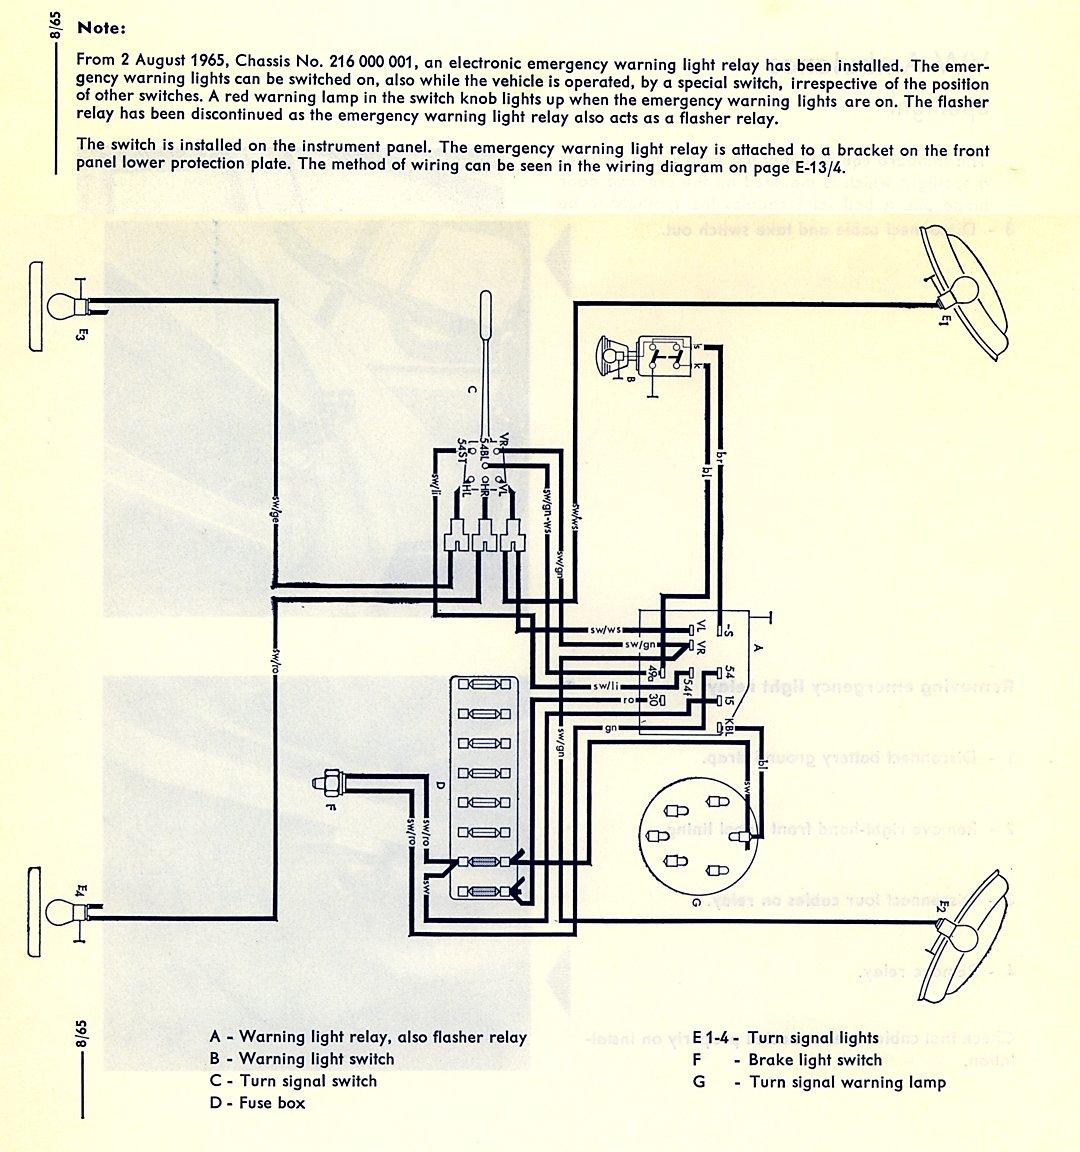 go light wiring diagram Collection-Go Light Wiring Diagram New thesamba Type 2 Wiring Diagrams 10-t